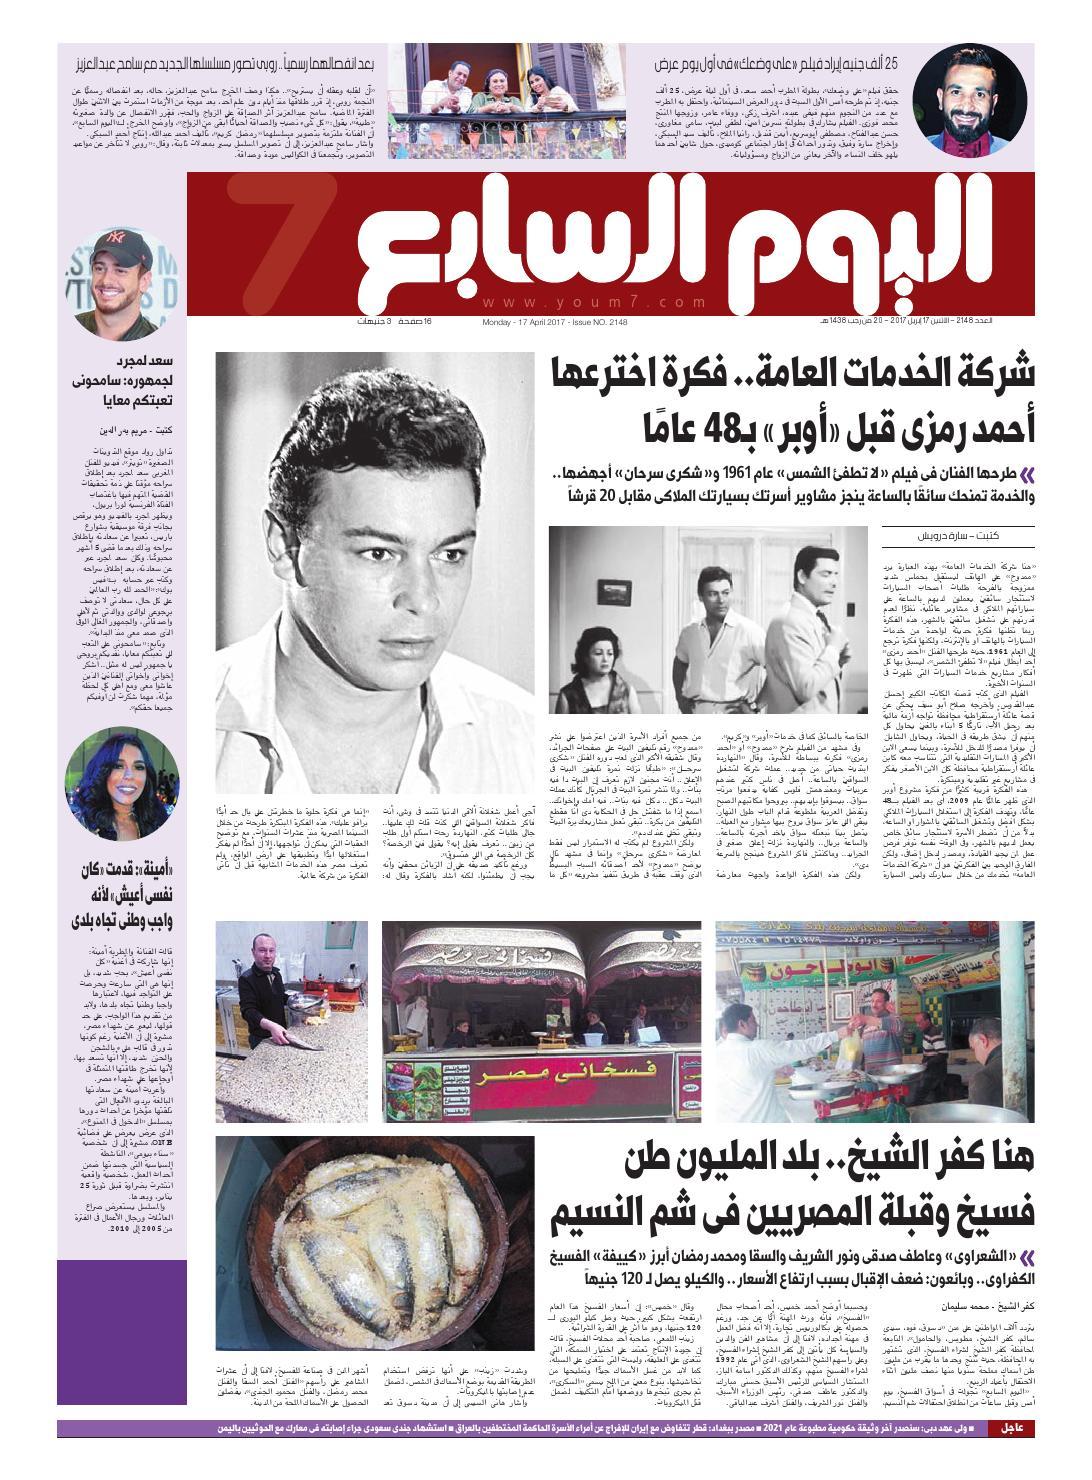 2bcbccfce4384 17 04 2017 youm7 by اليوم السابع - issuu